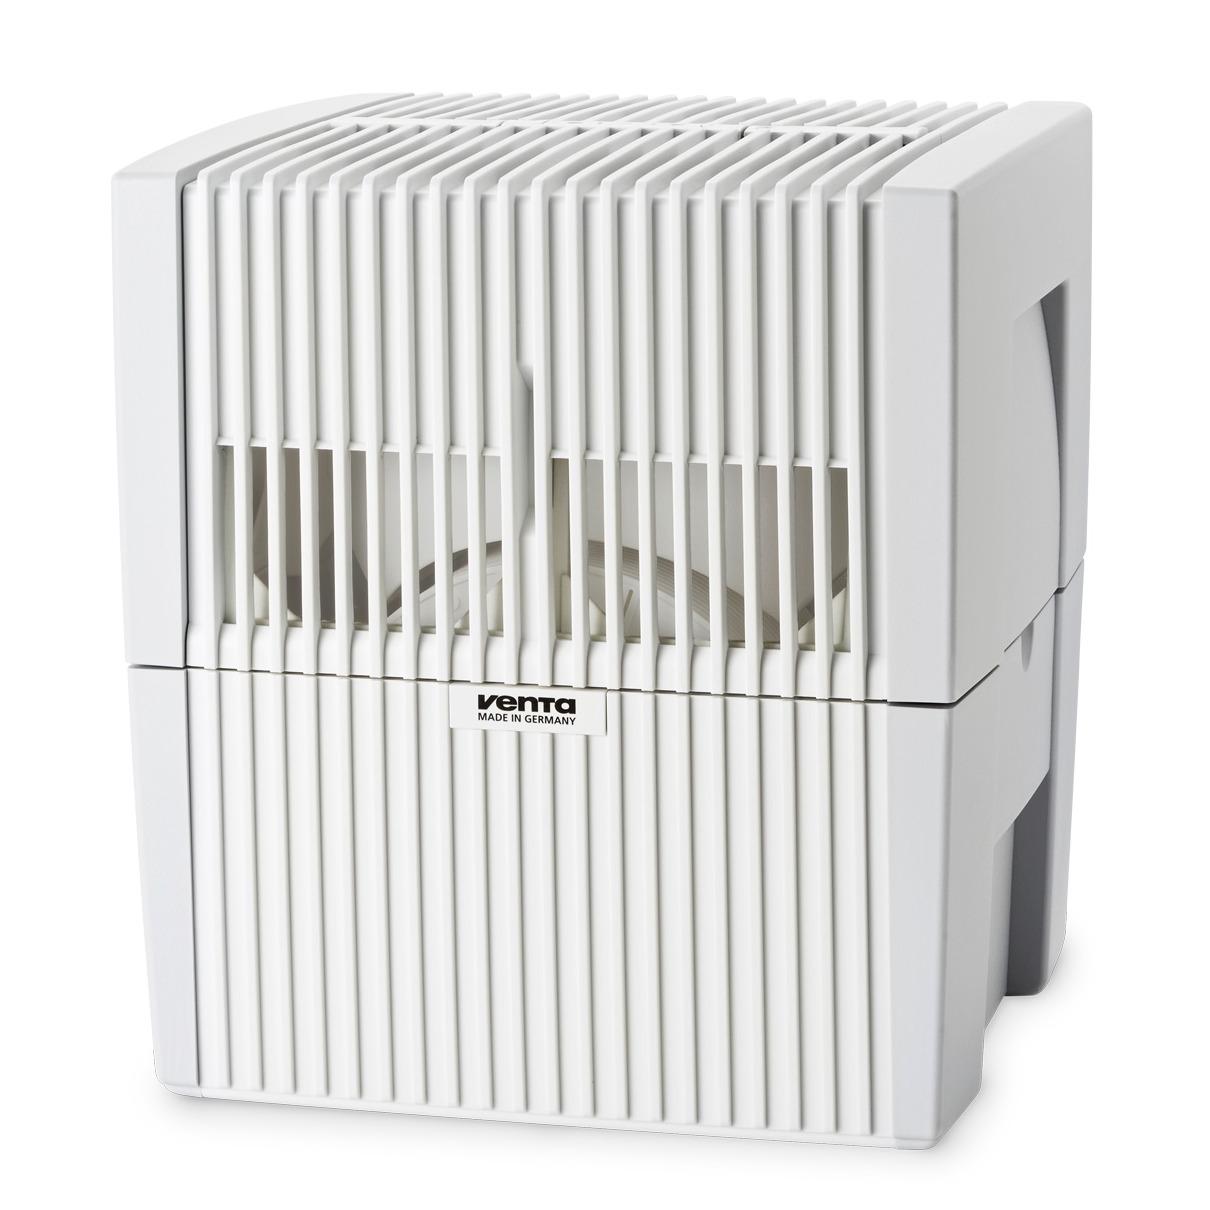 Venta luchtbevochtiger LW25 wit - Prijsvergelijk